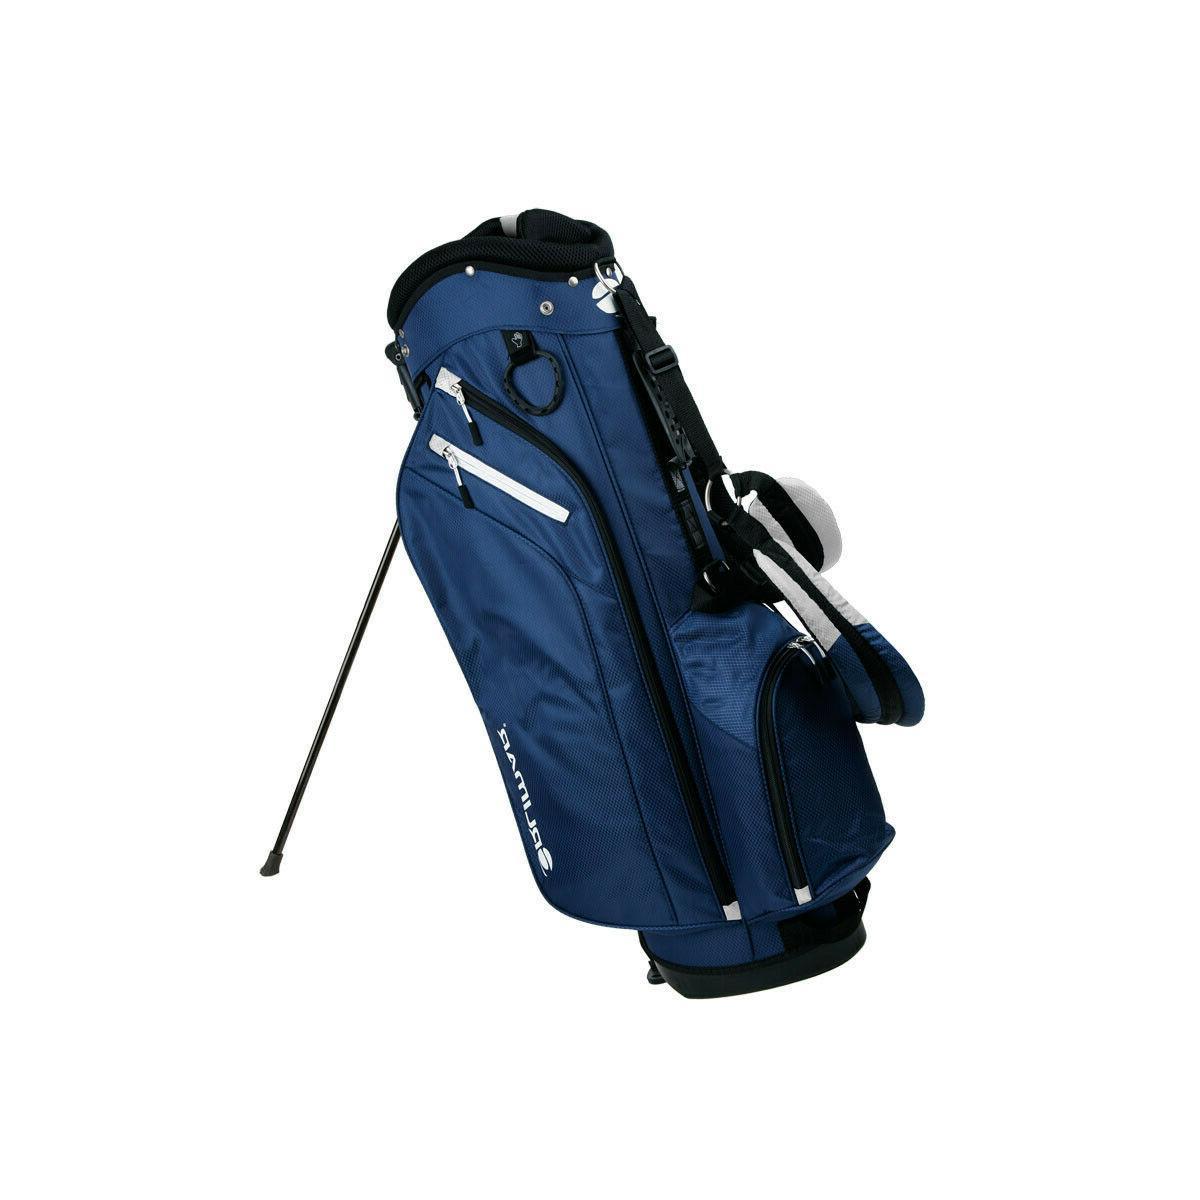 Orlimar SRX 7.4 Golf Stand Bag -  Navy Blue - New!